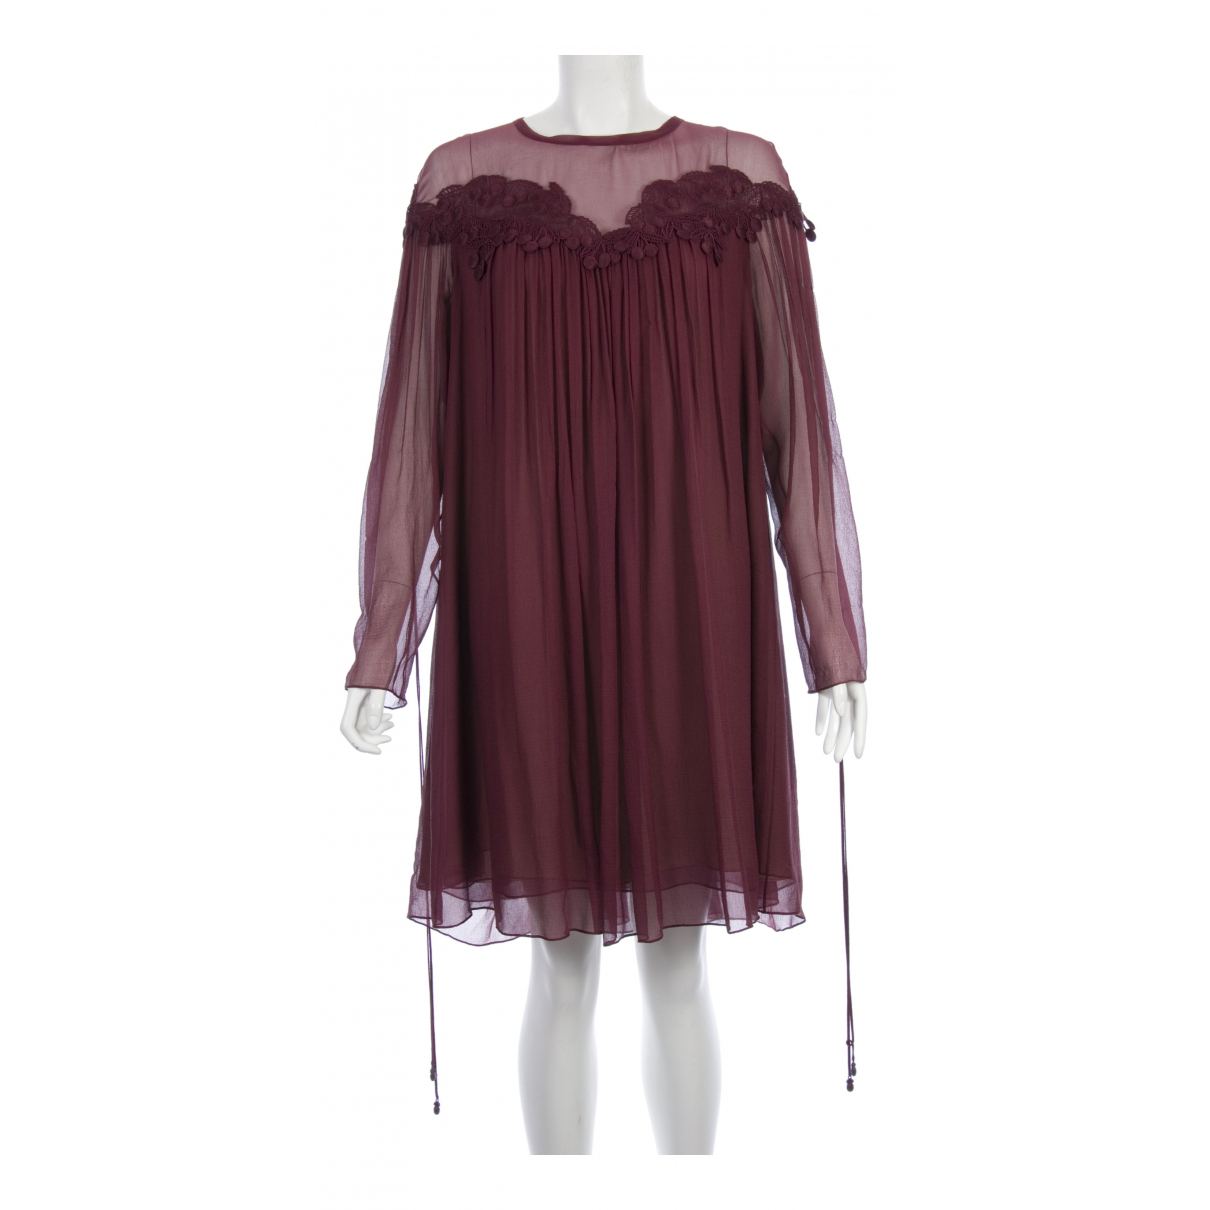 Chloe \N Kleid in  Bordeauxrot Seide